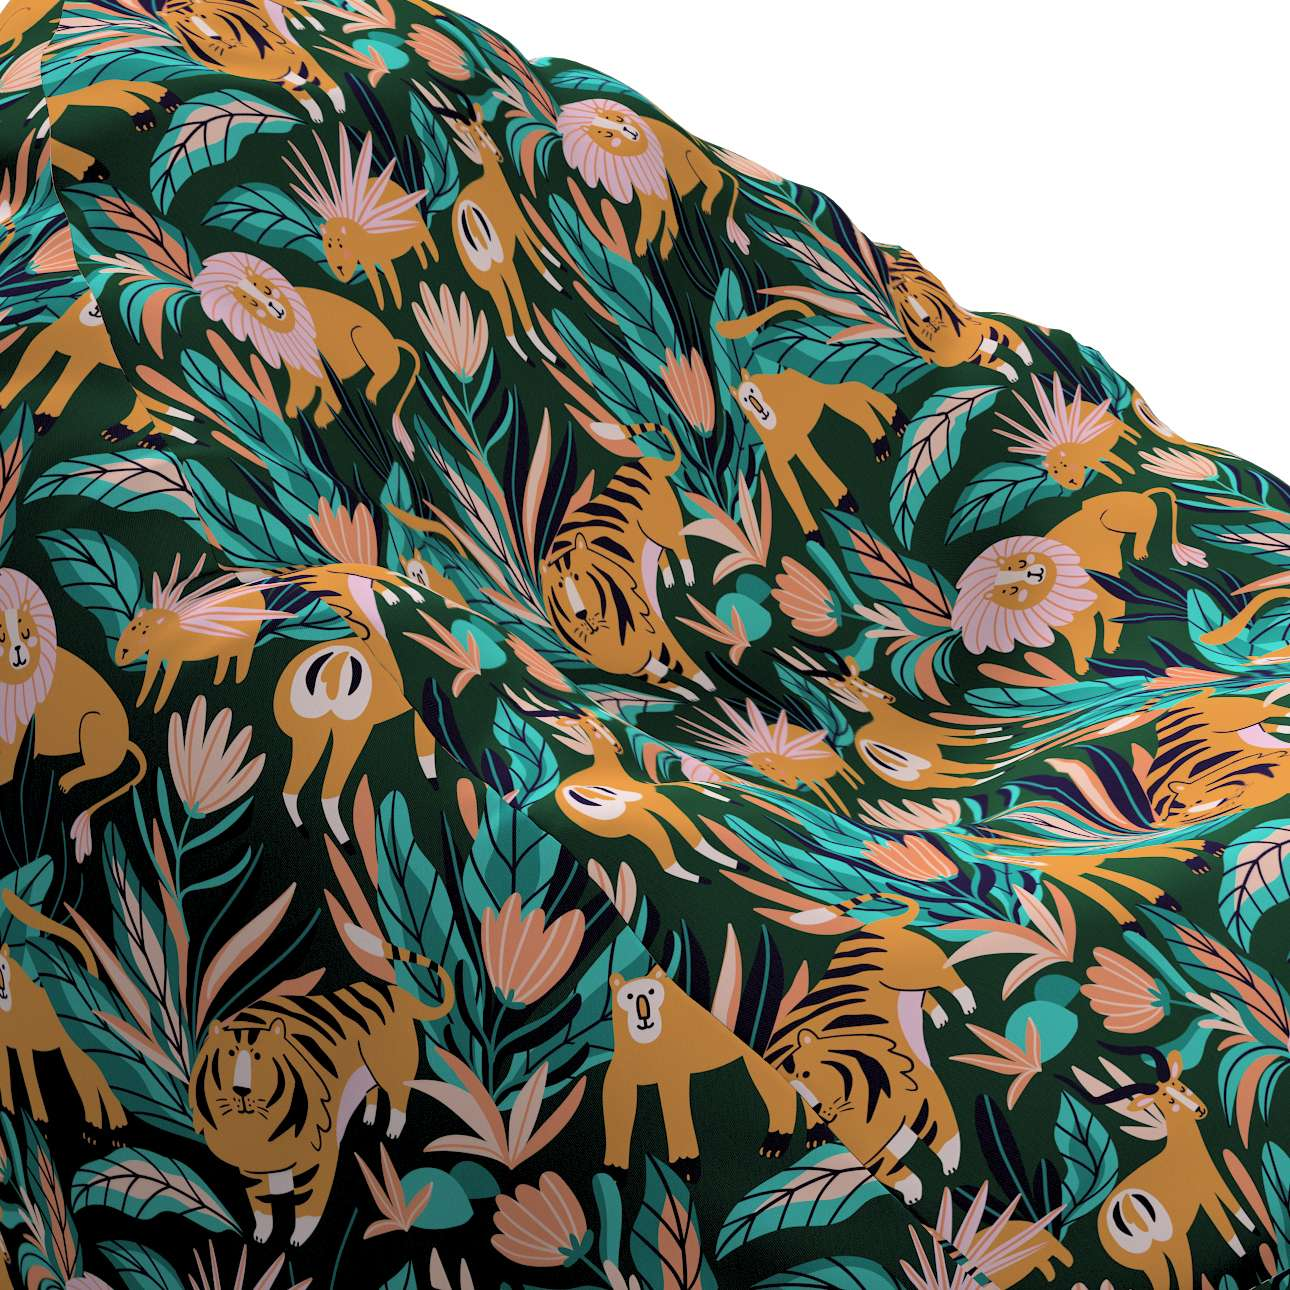 Sedací vak Bowli v kolekci Magic Collection, látka: 500-42